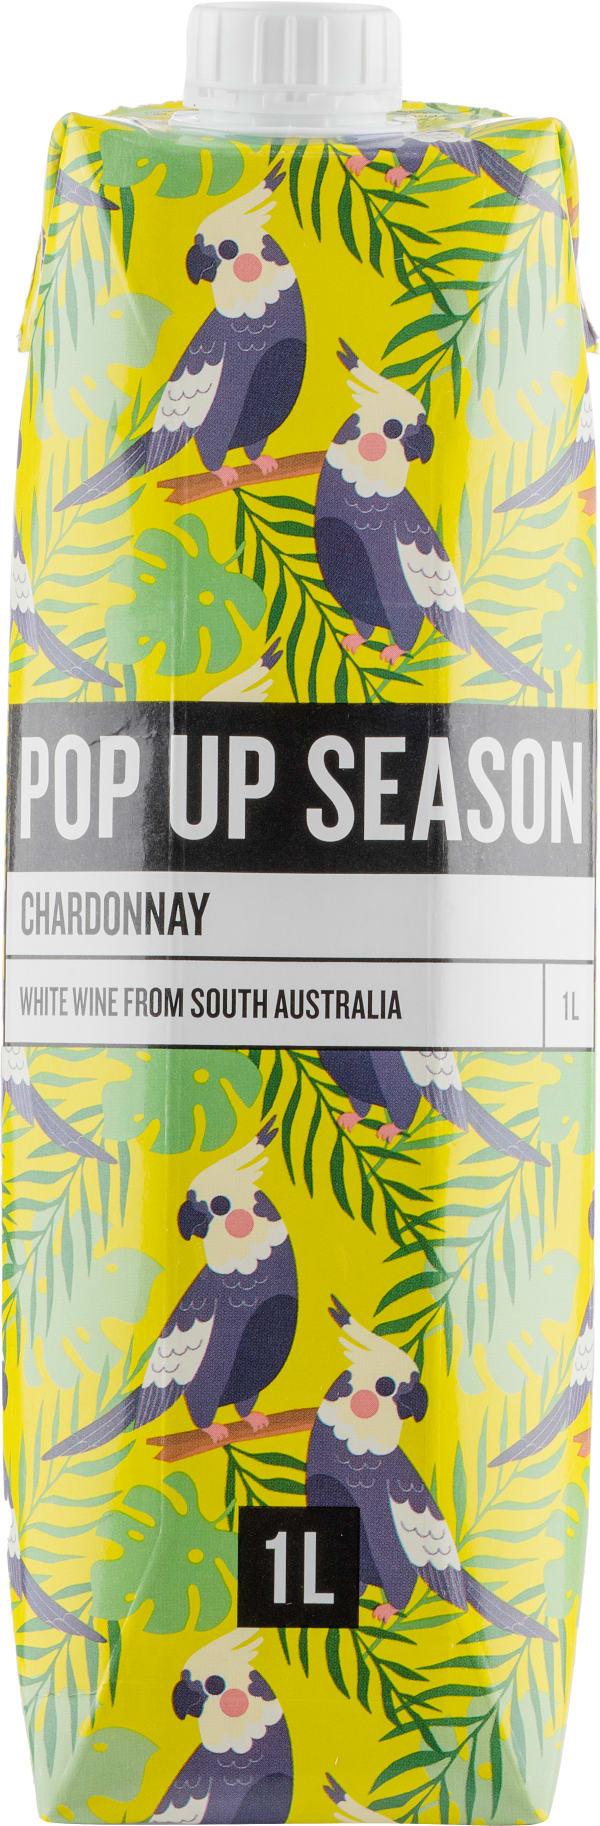 Pop Up Season Chardonnay 2018 carton package